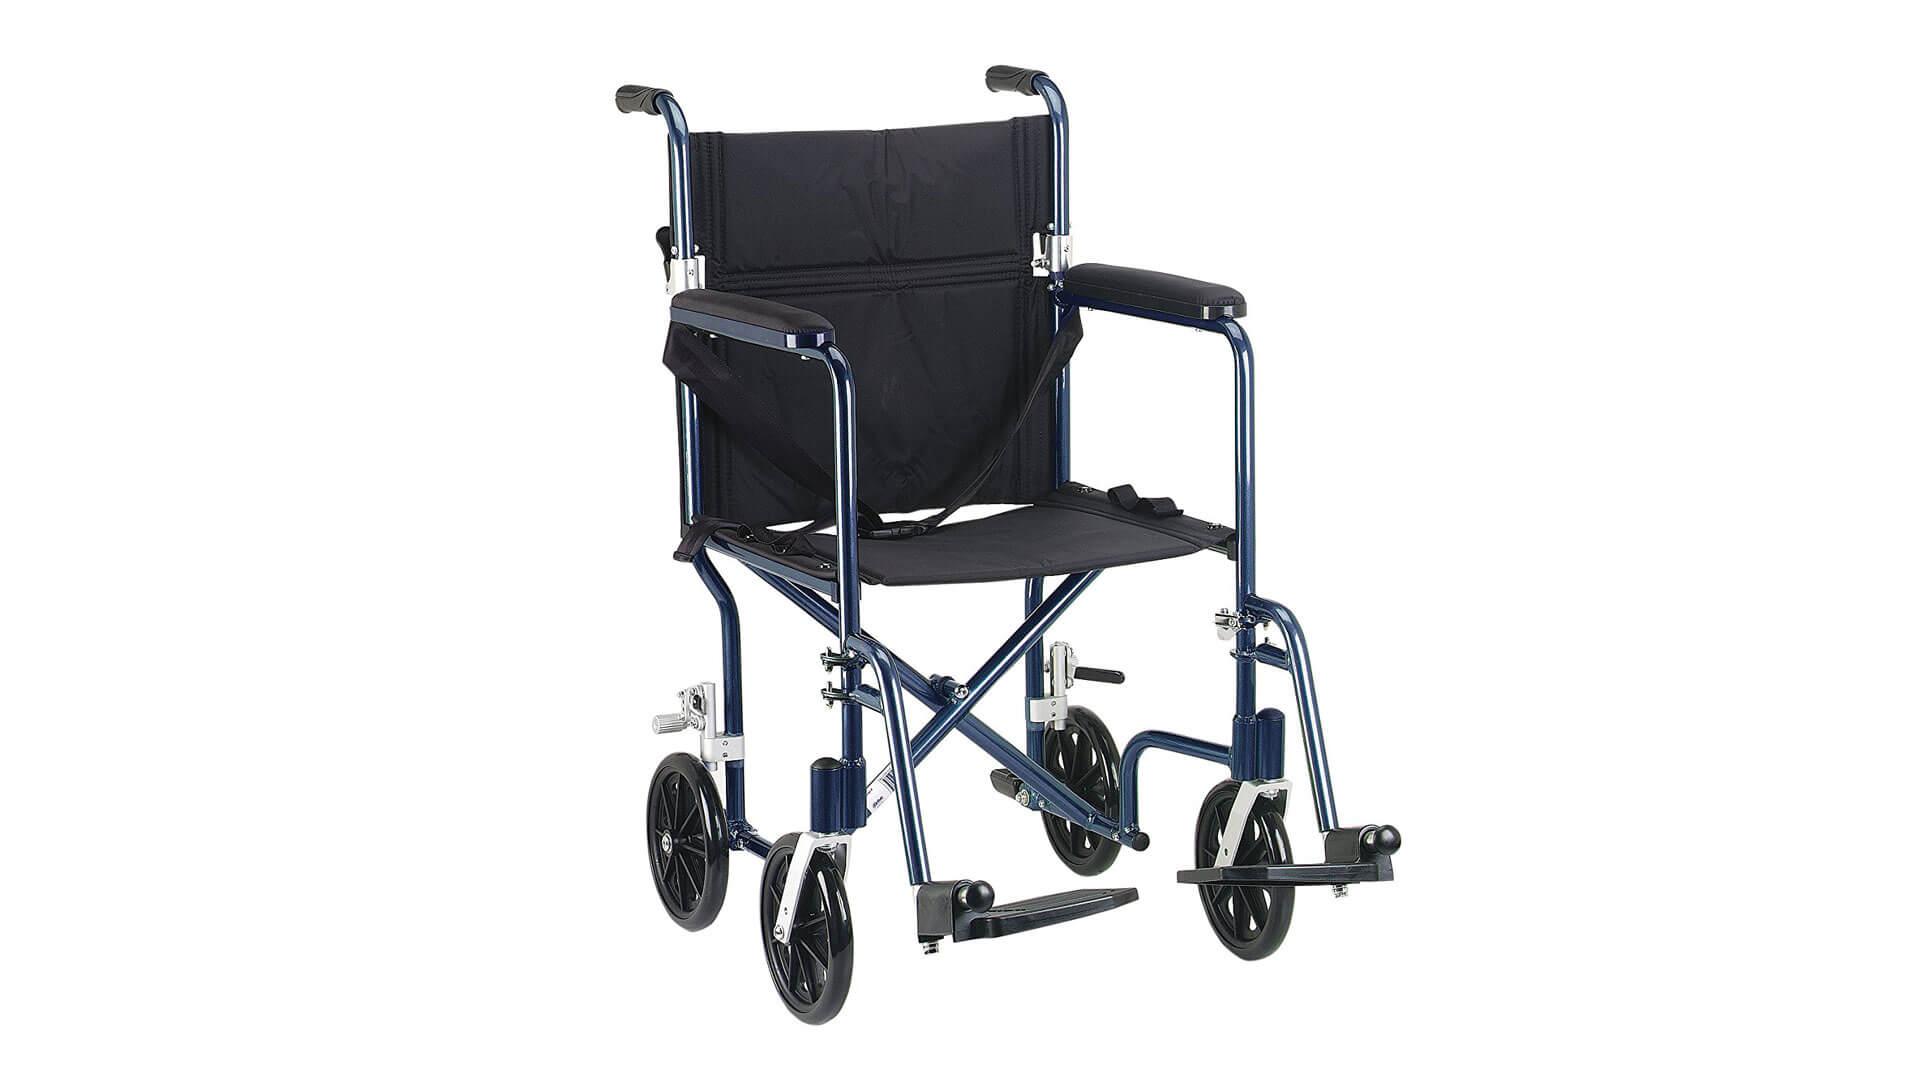 Deluxe Fly Weight Deluxe Aluminum Transport Wheelchair